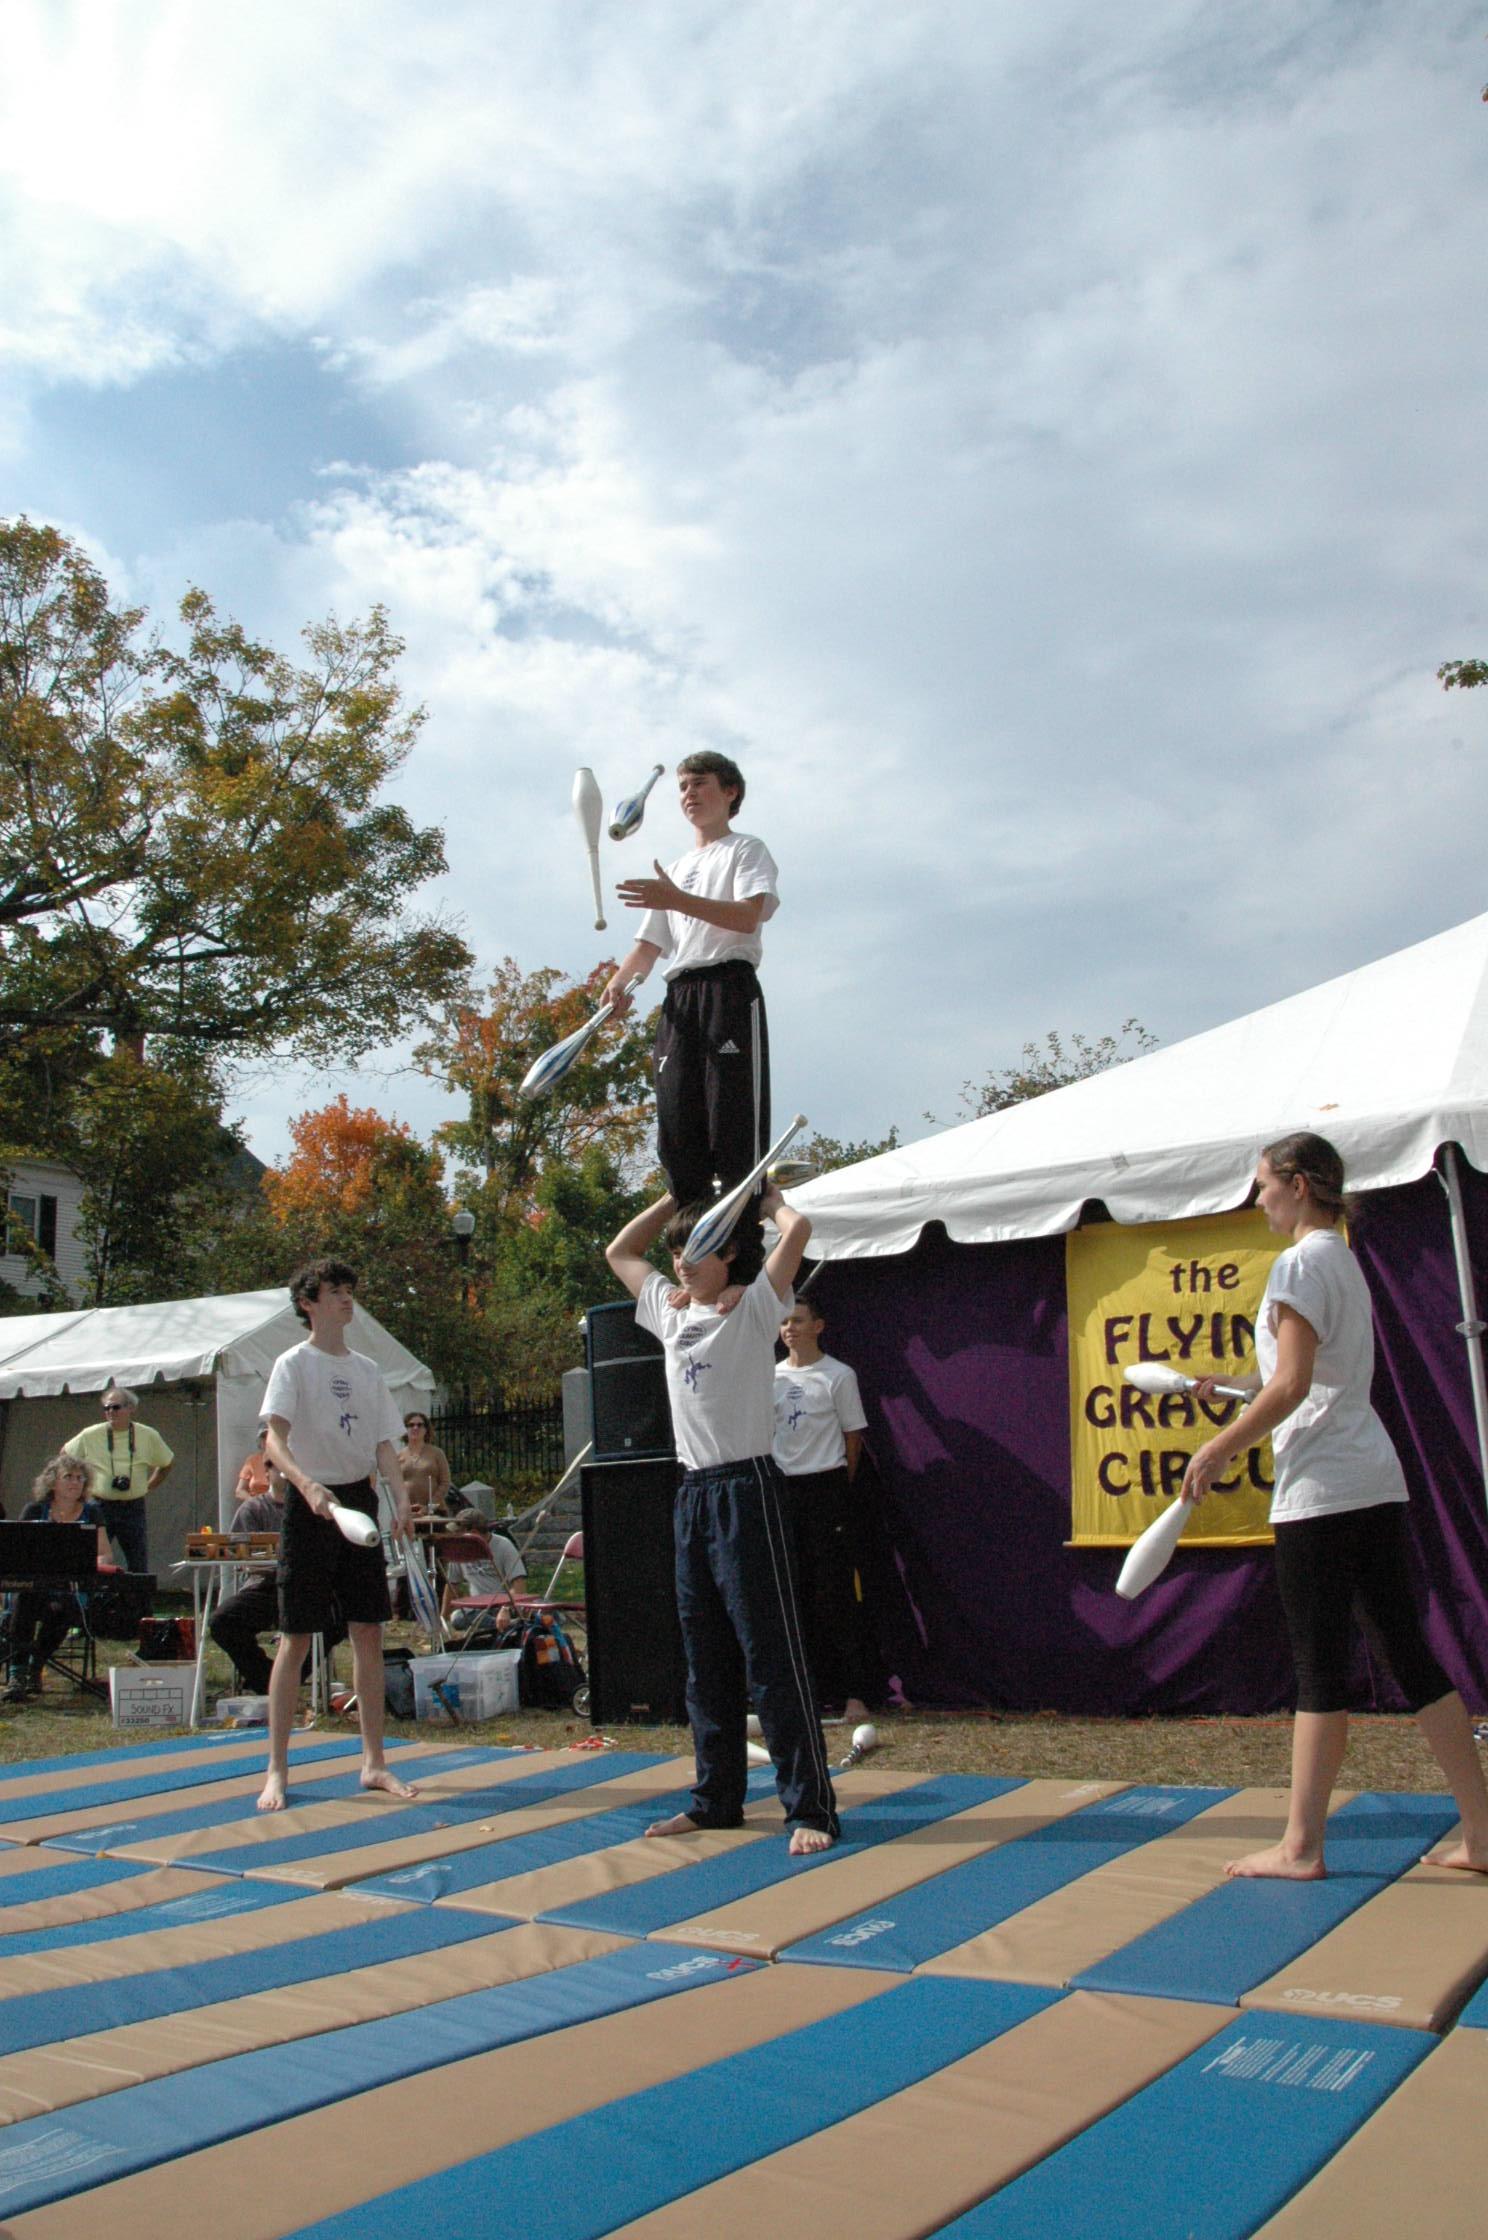 2012-10-06 Flyin Gravity Circus - Pumpkin 118.JPG